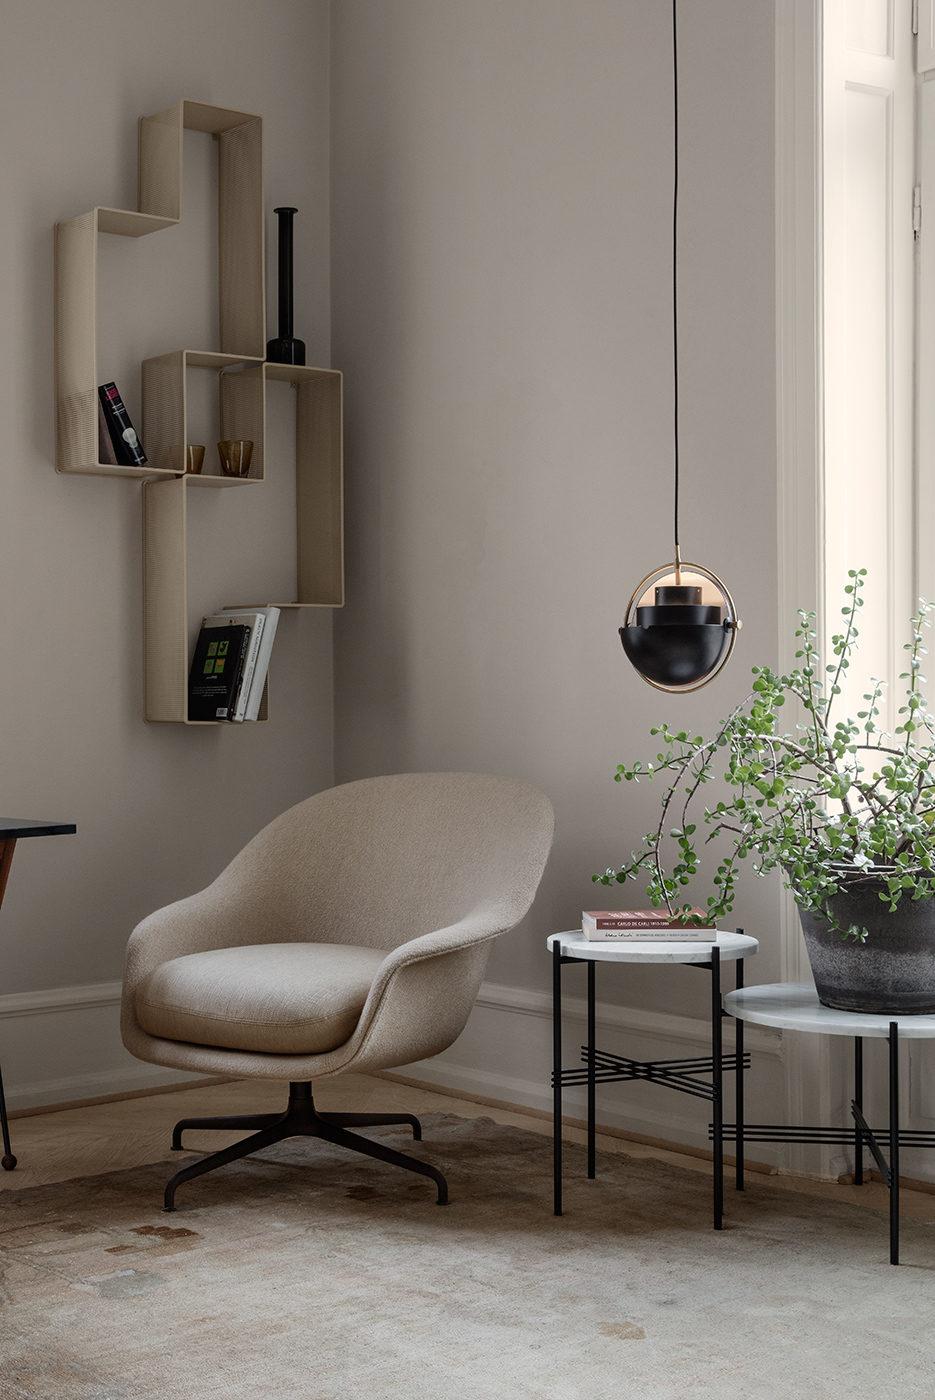 MULTI-LITE Pendant Lamp, Brass – Charcoal Black